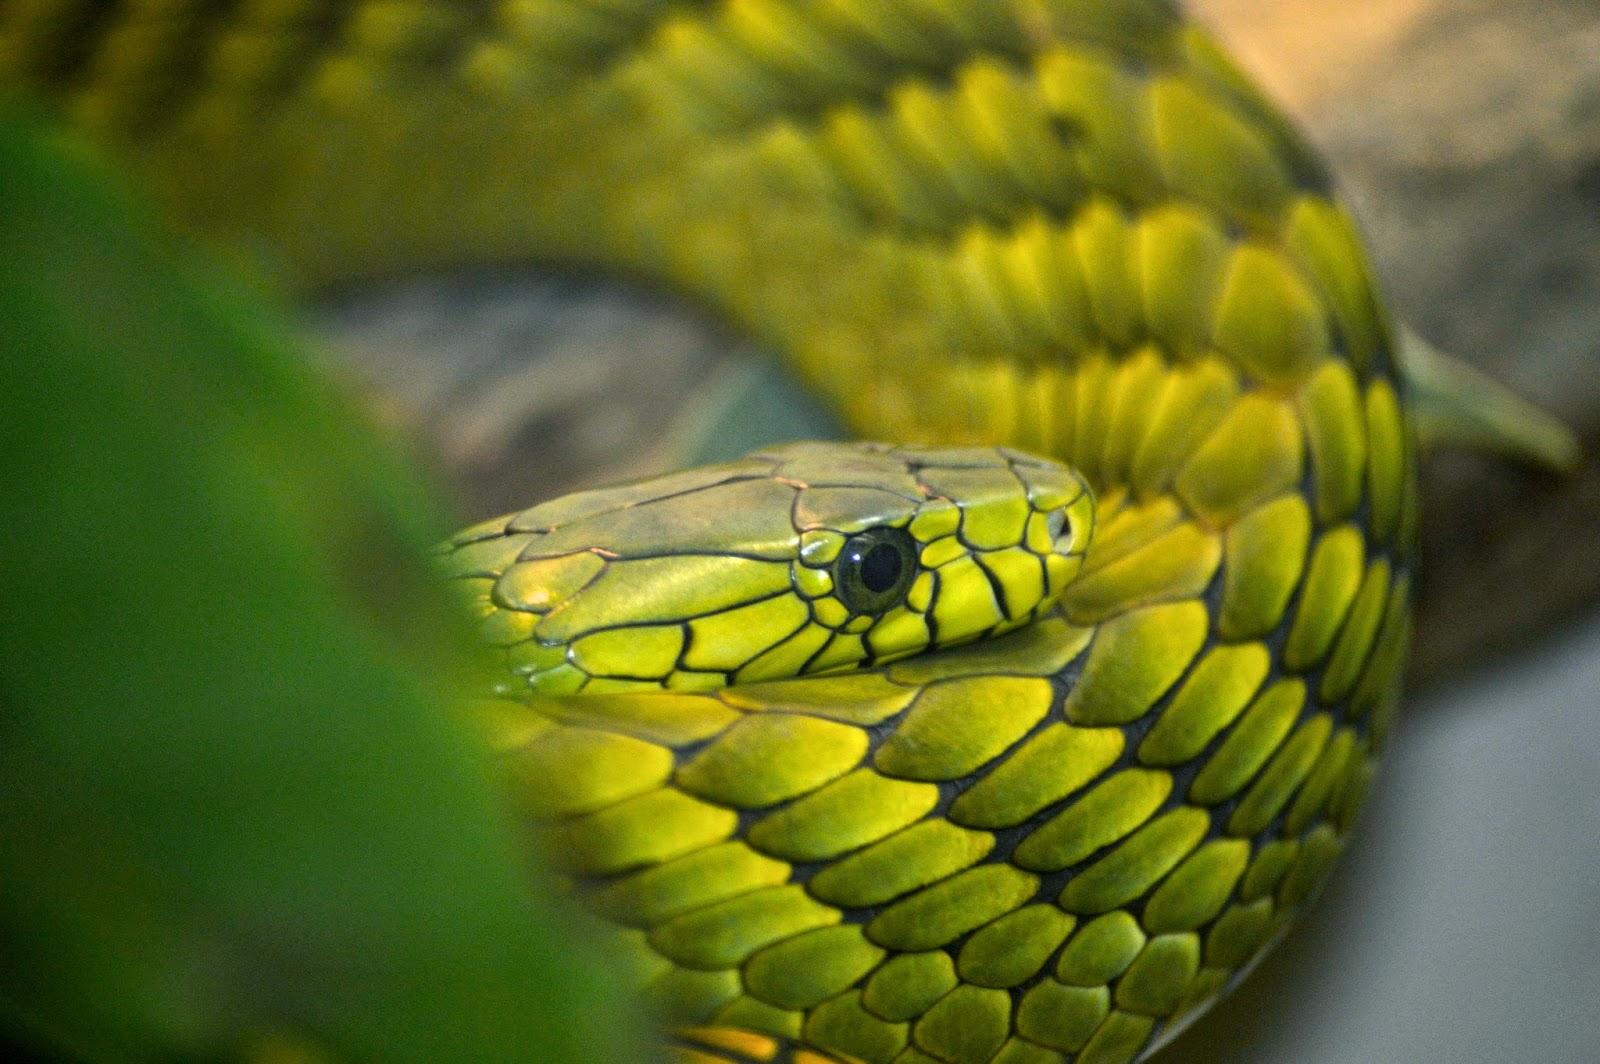 Nikon-D3200-Image-example-snake